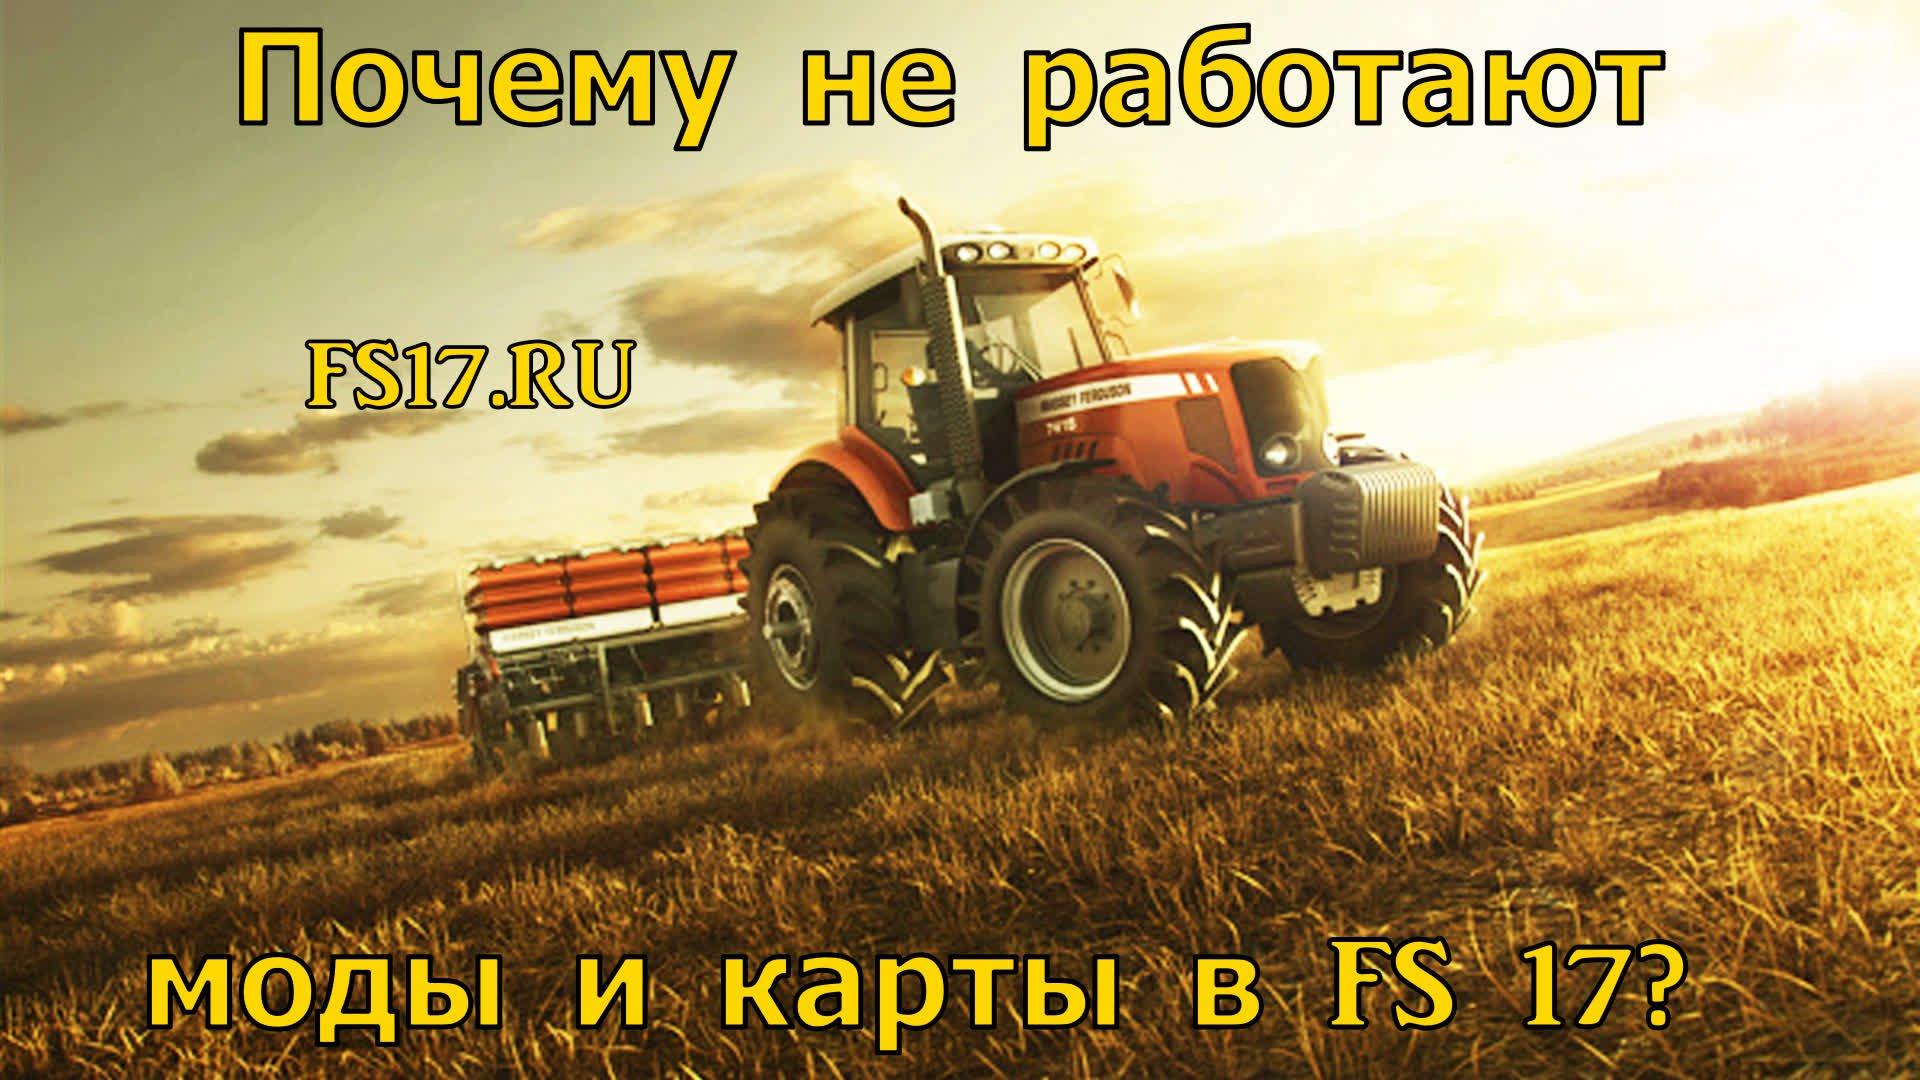 Farming simulator 2015 моды работник